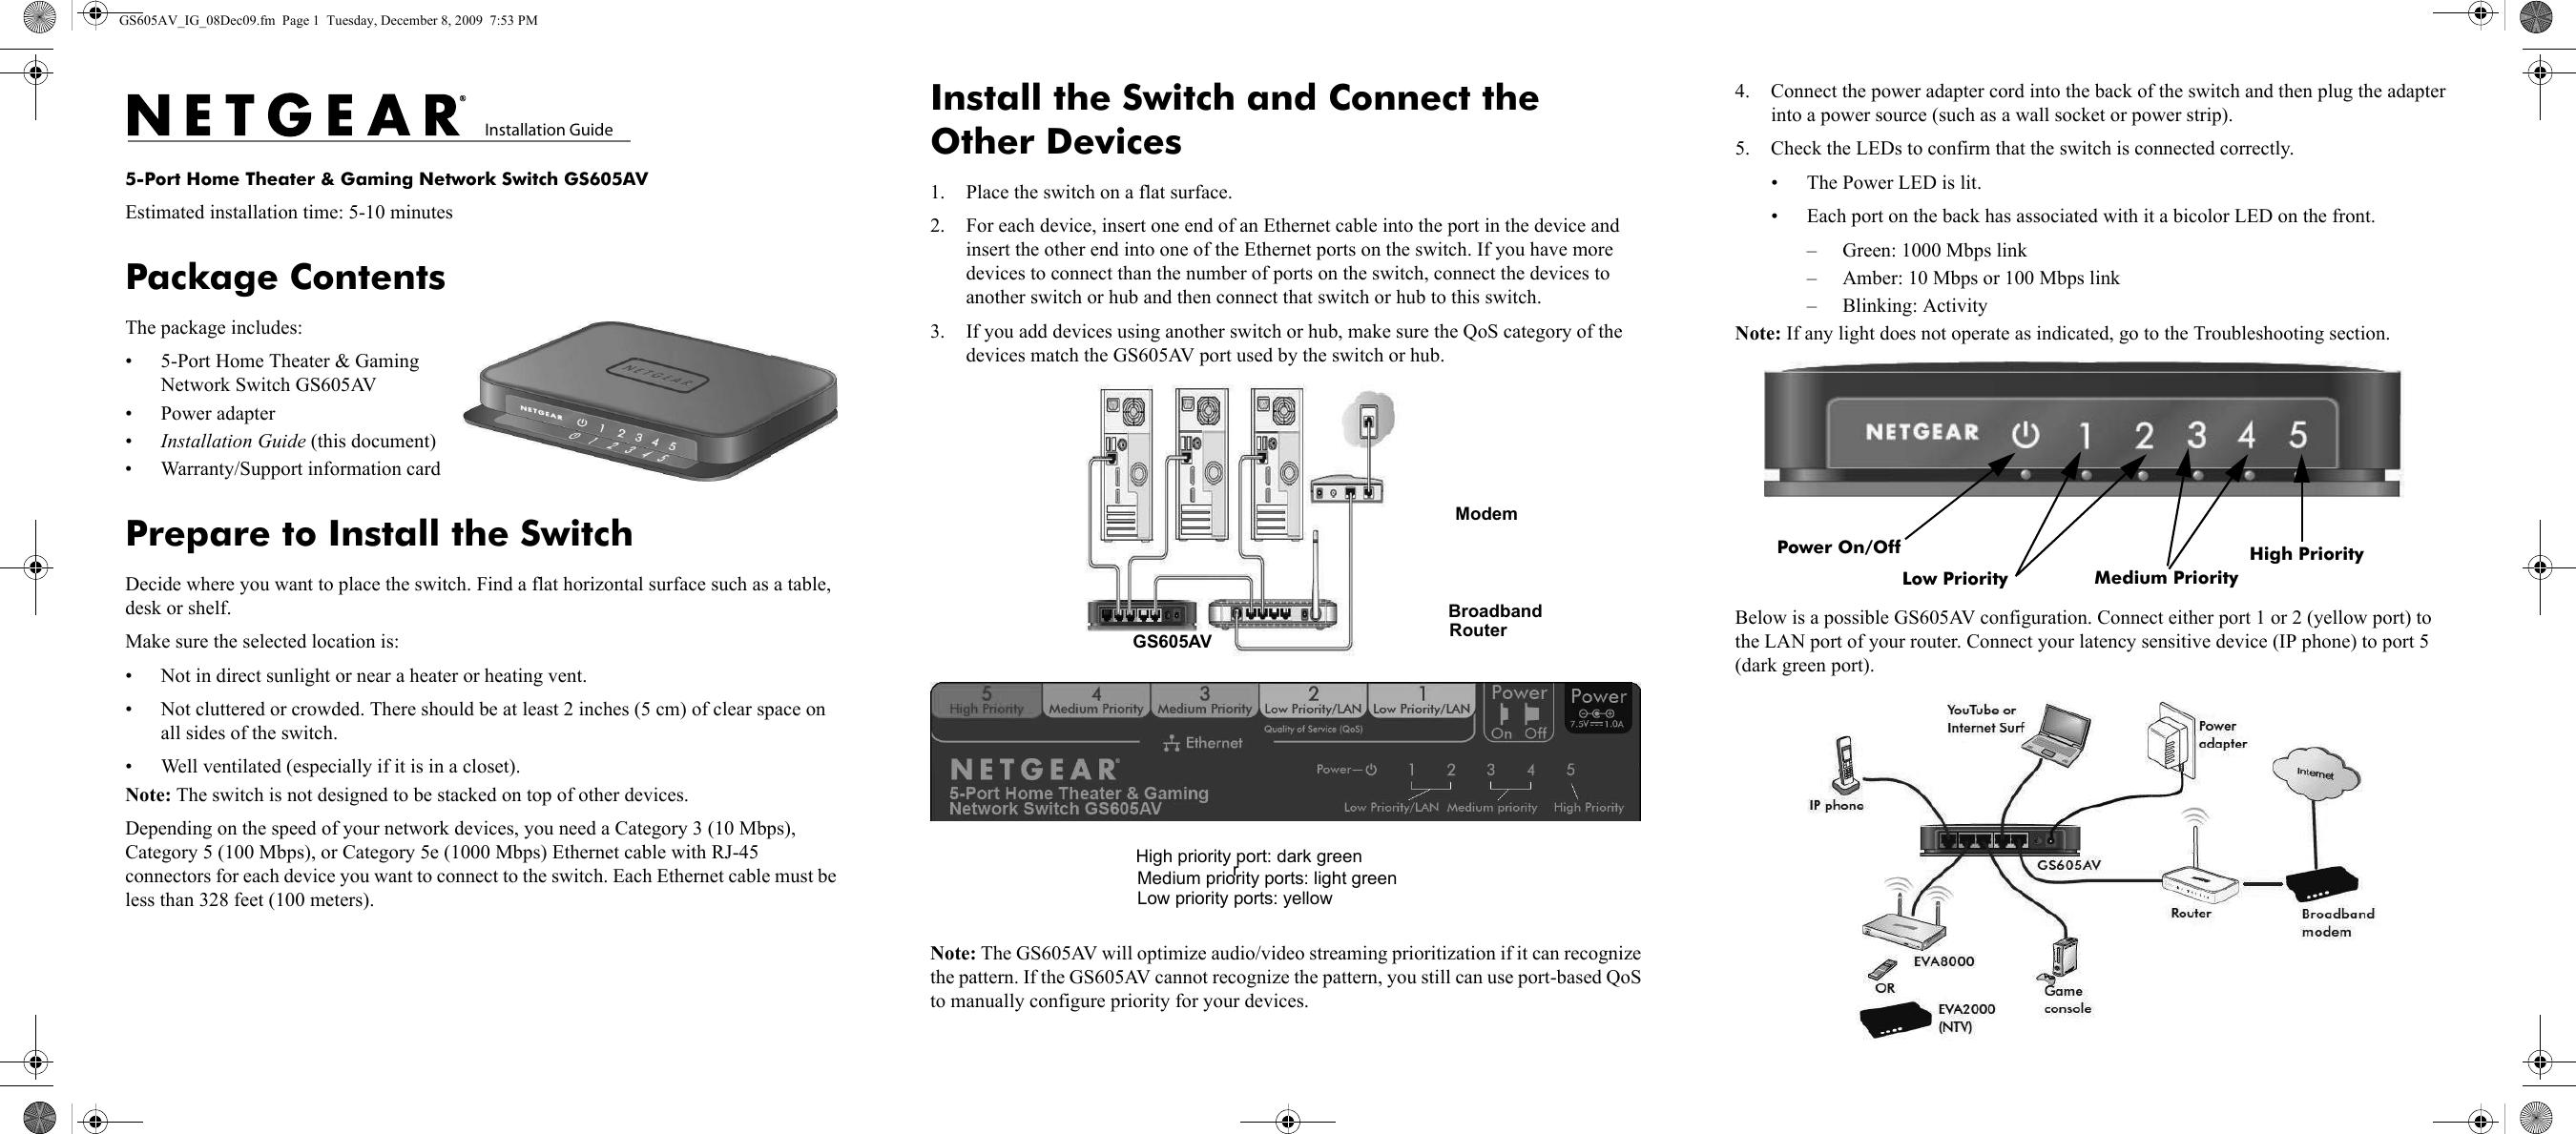 Netgear Home Theater Network Switch Gs605Av 100Nas Users Manual ...